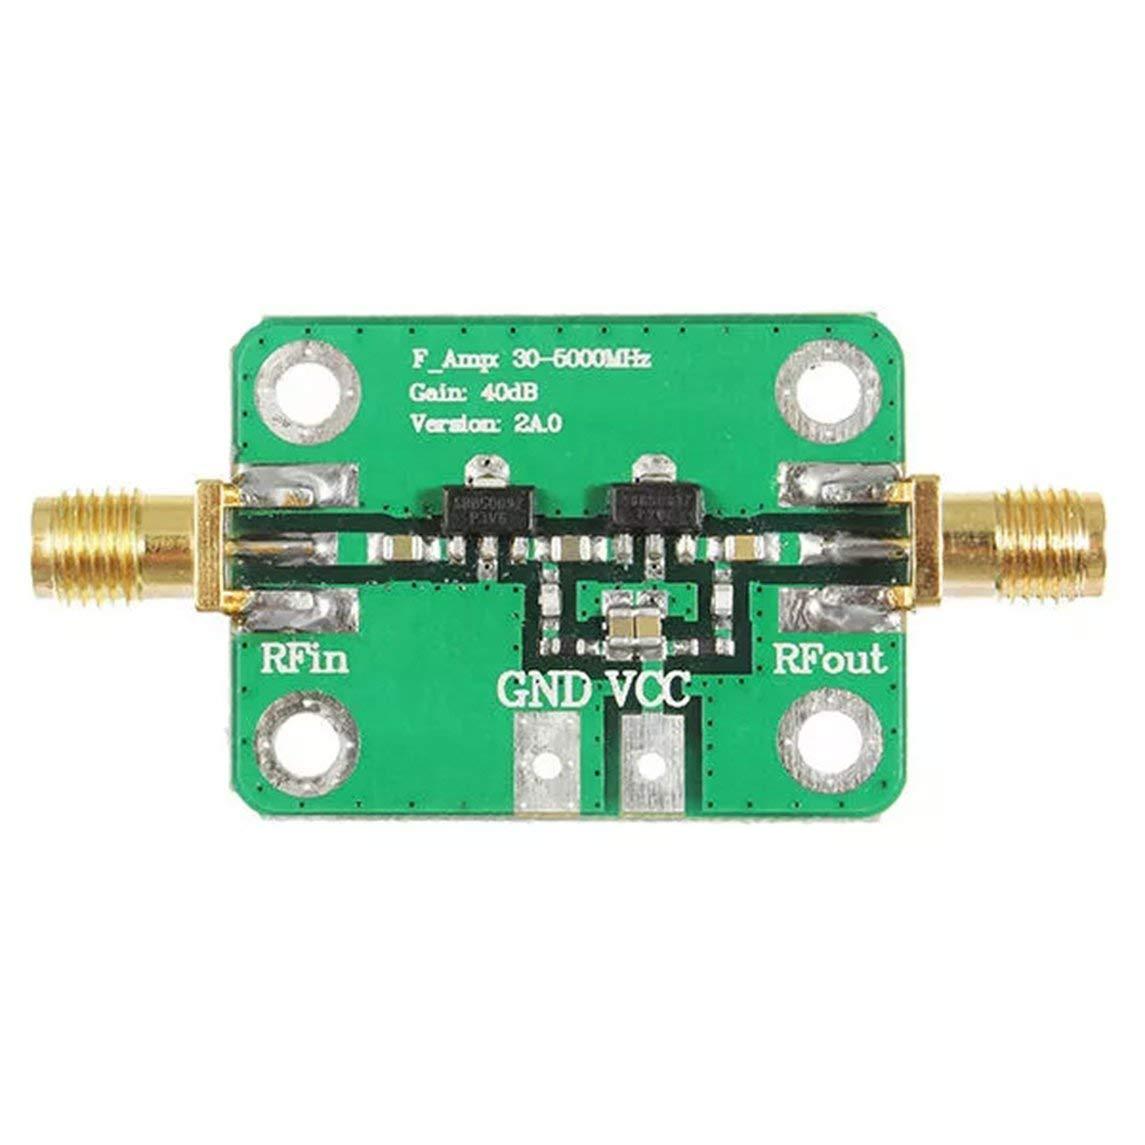 YXTFN 30-4000Mhz 40Db Gain Rf Broadband Amplifier Module for Fm Hf VHF/Uhf 50Ω UBS by Magicalworld (Image #1)